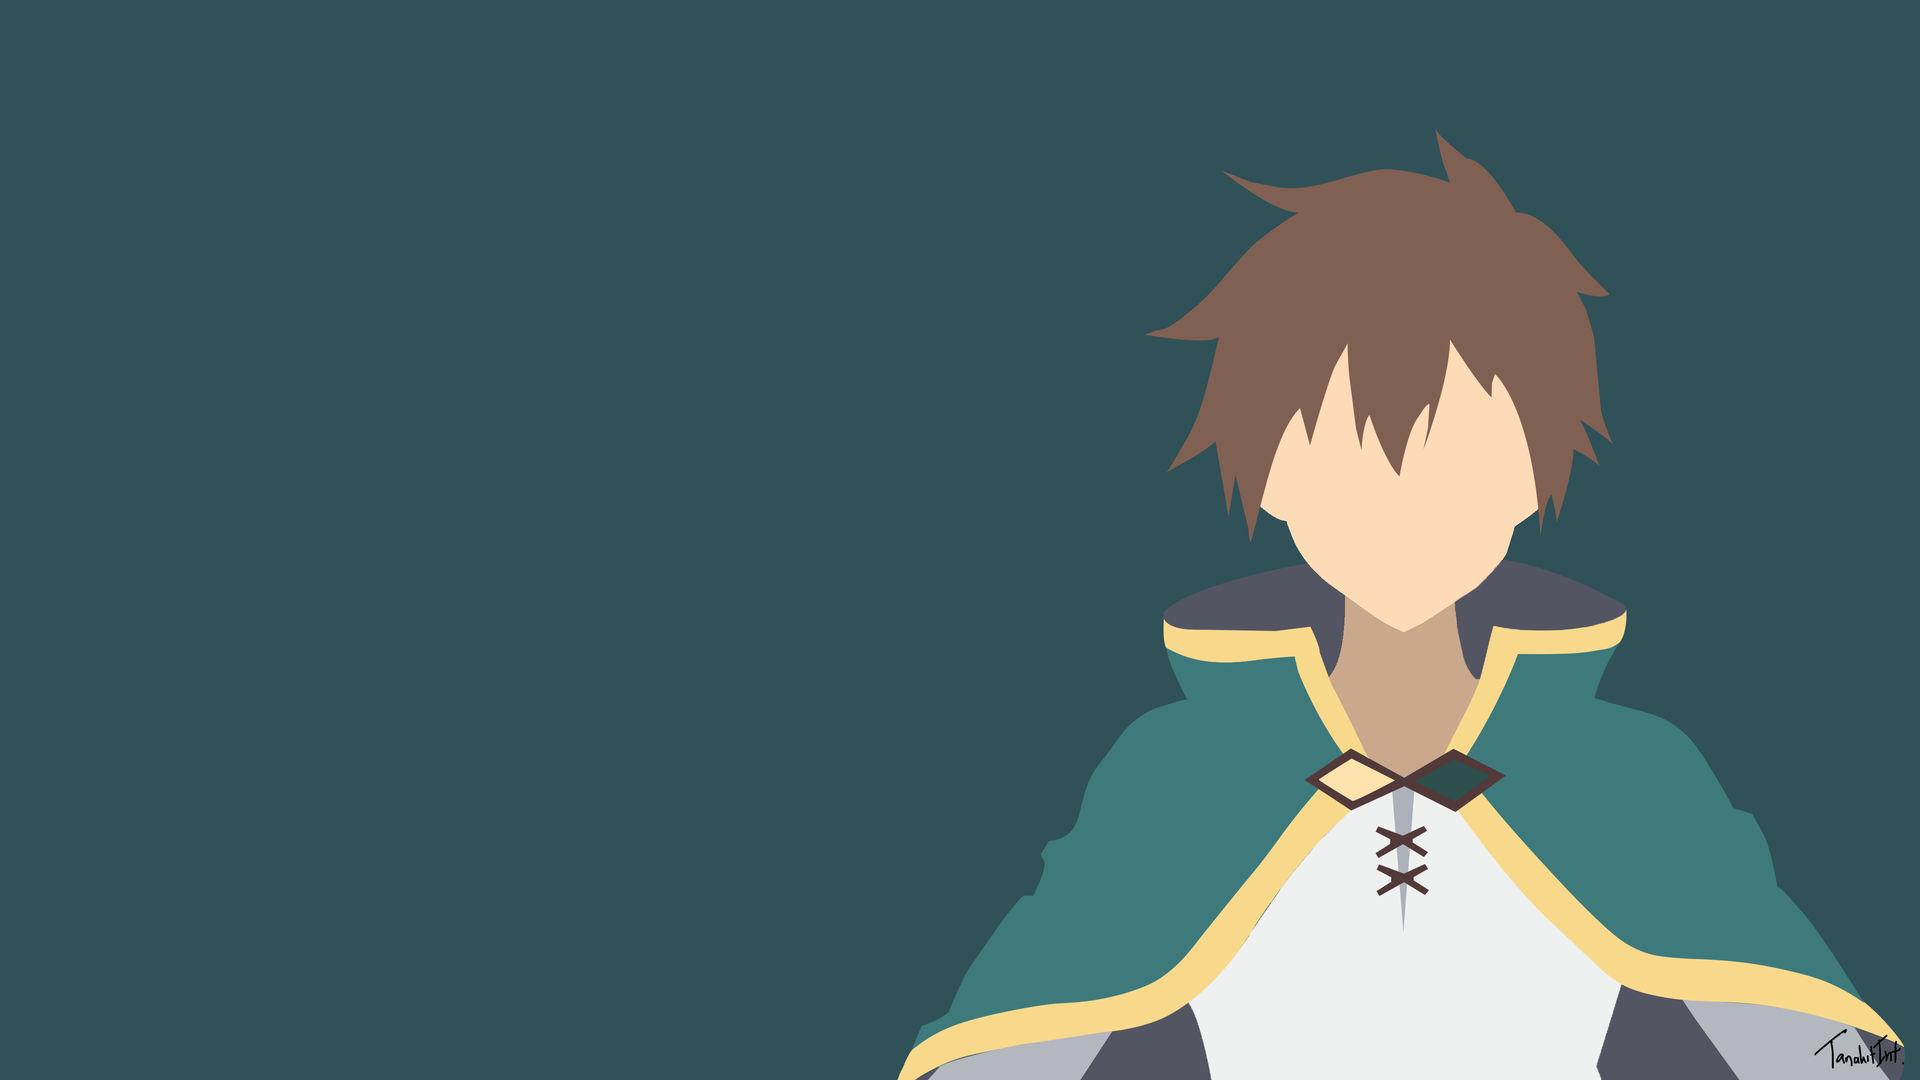 Satou Kazuma (Konosuba) Minimalist Anime Wallpaper by ...